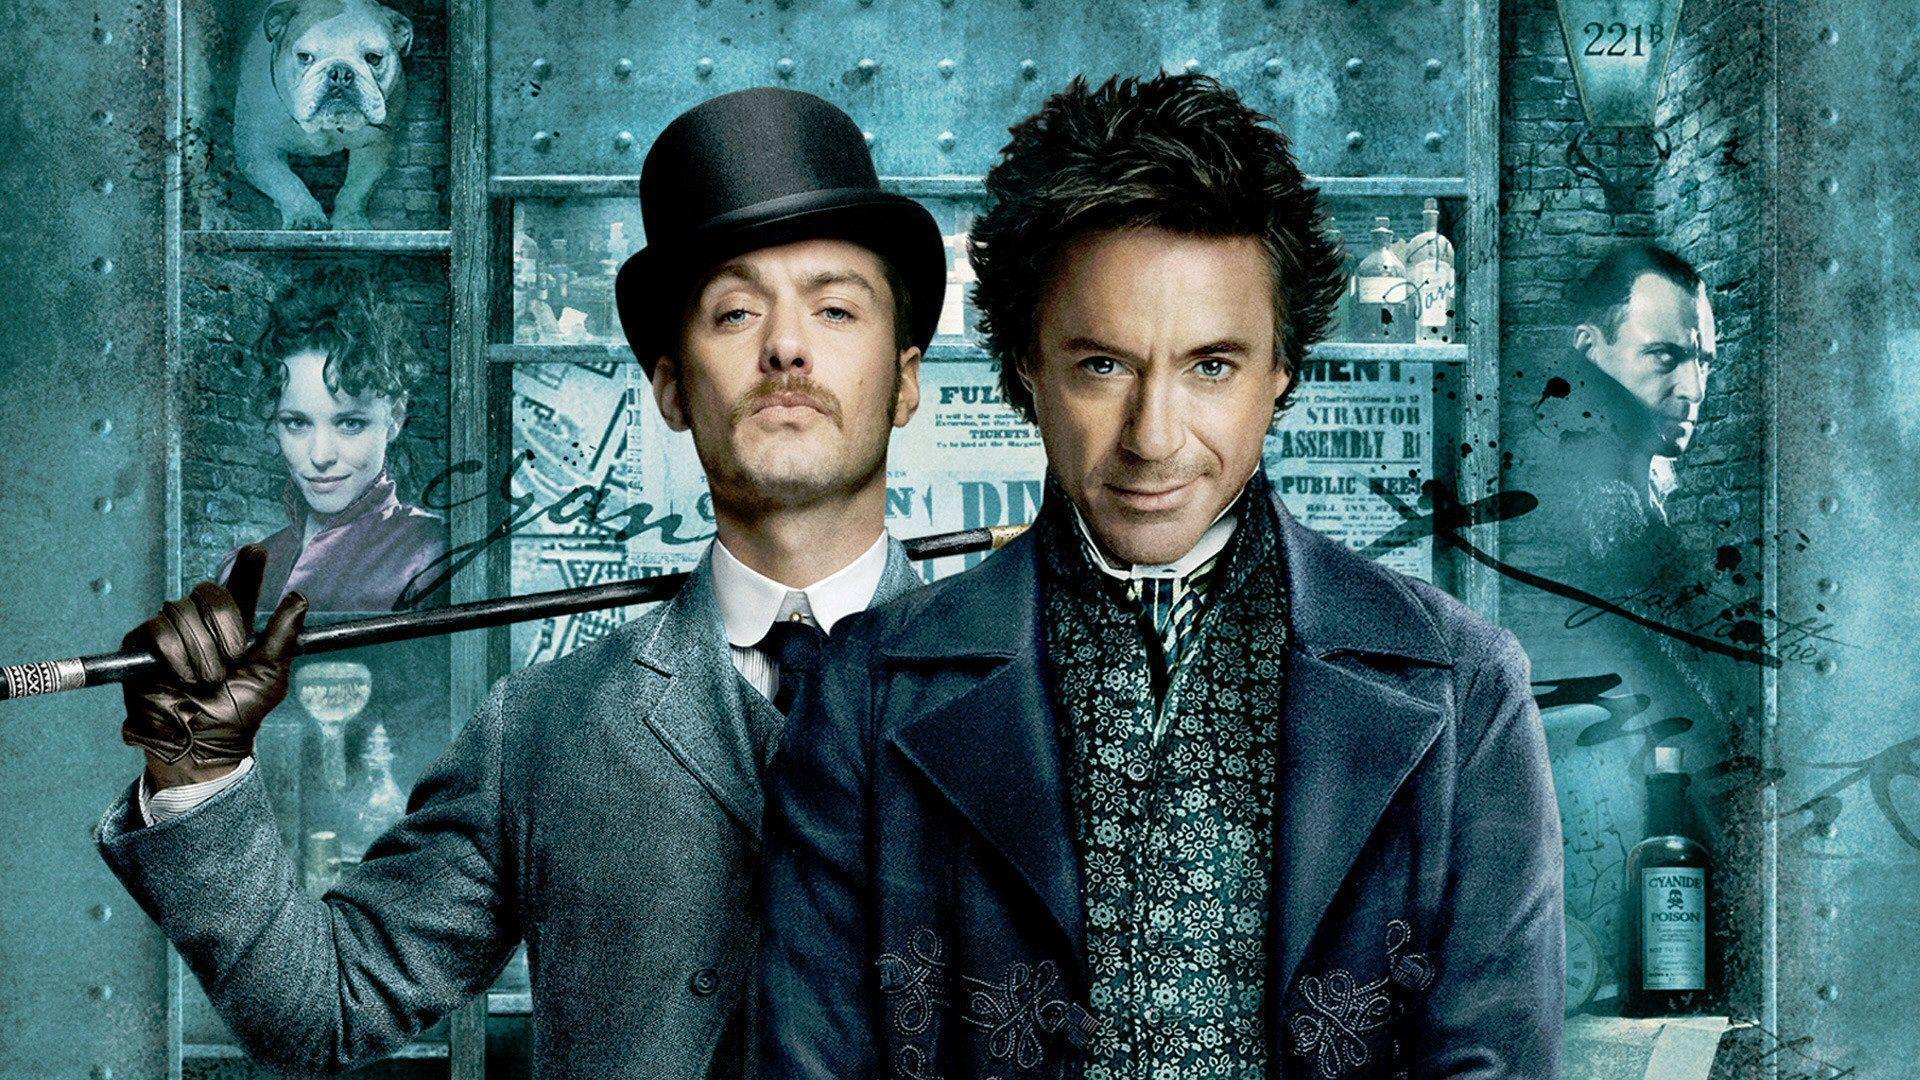 Robert Downey Jr Sherlock Holmes Wallpapers - Wallpaper Cave